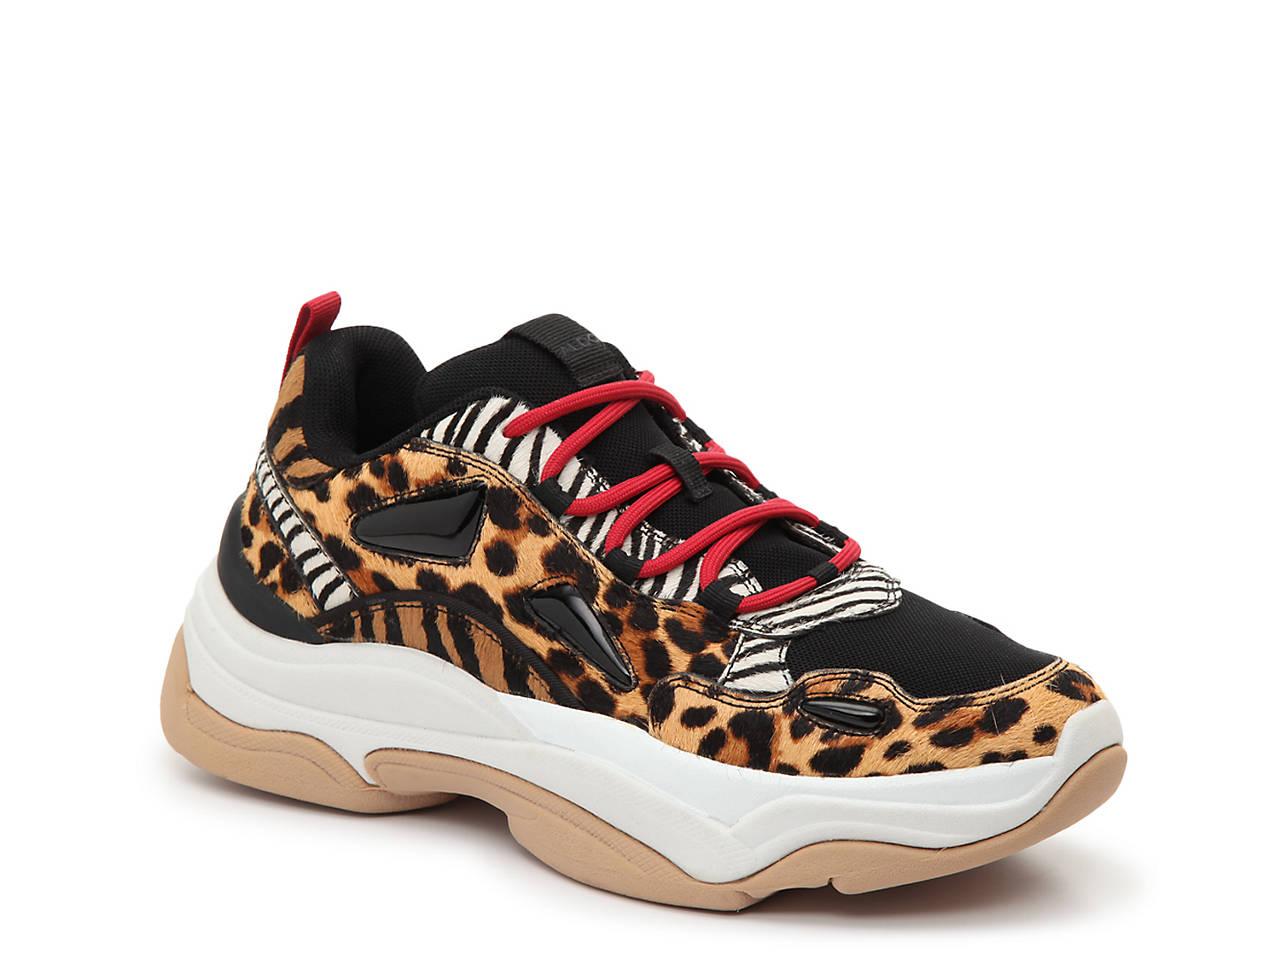 7f84279a2910 Aldo Umoavia Aggressive Sneaker Women's Shoes | DSW